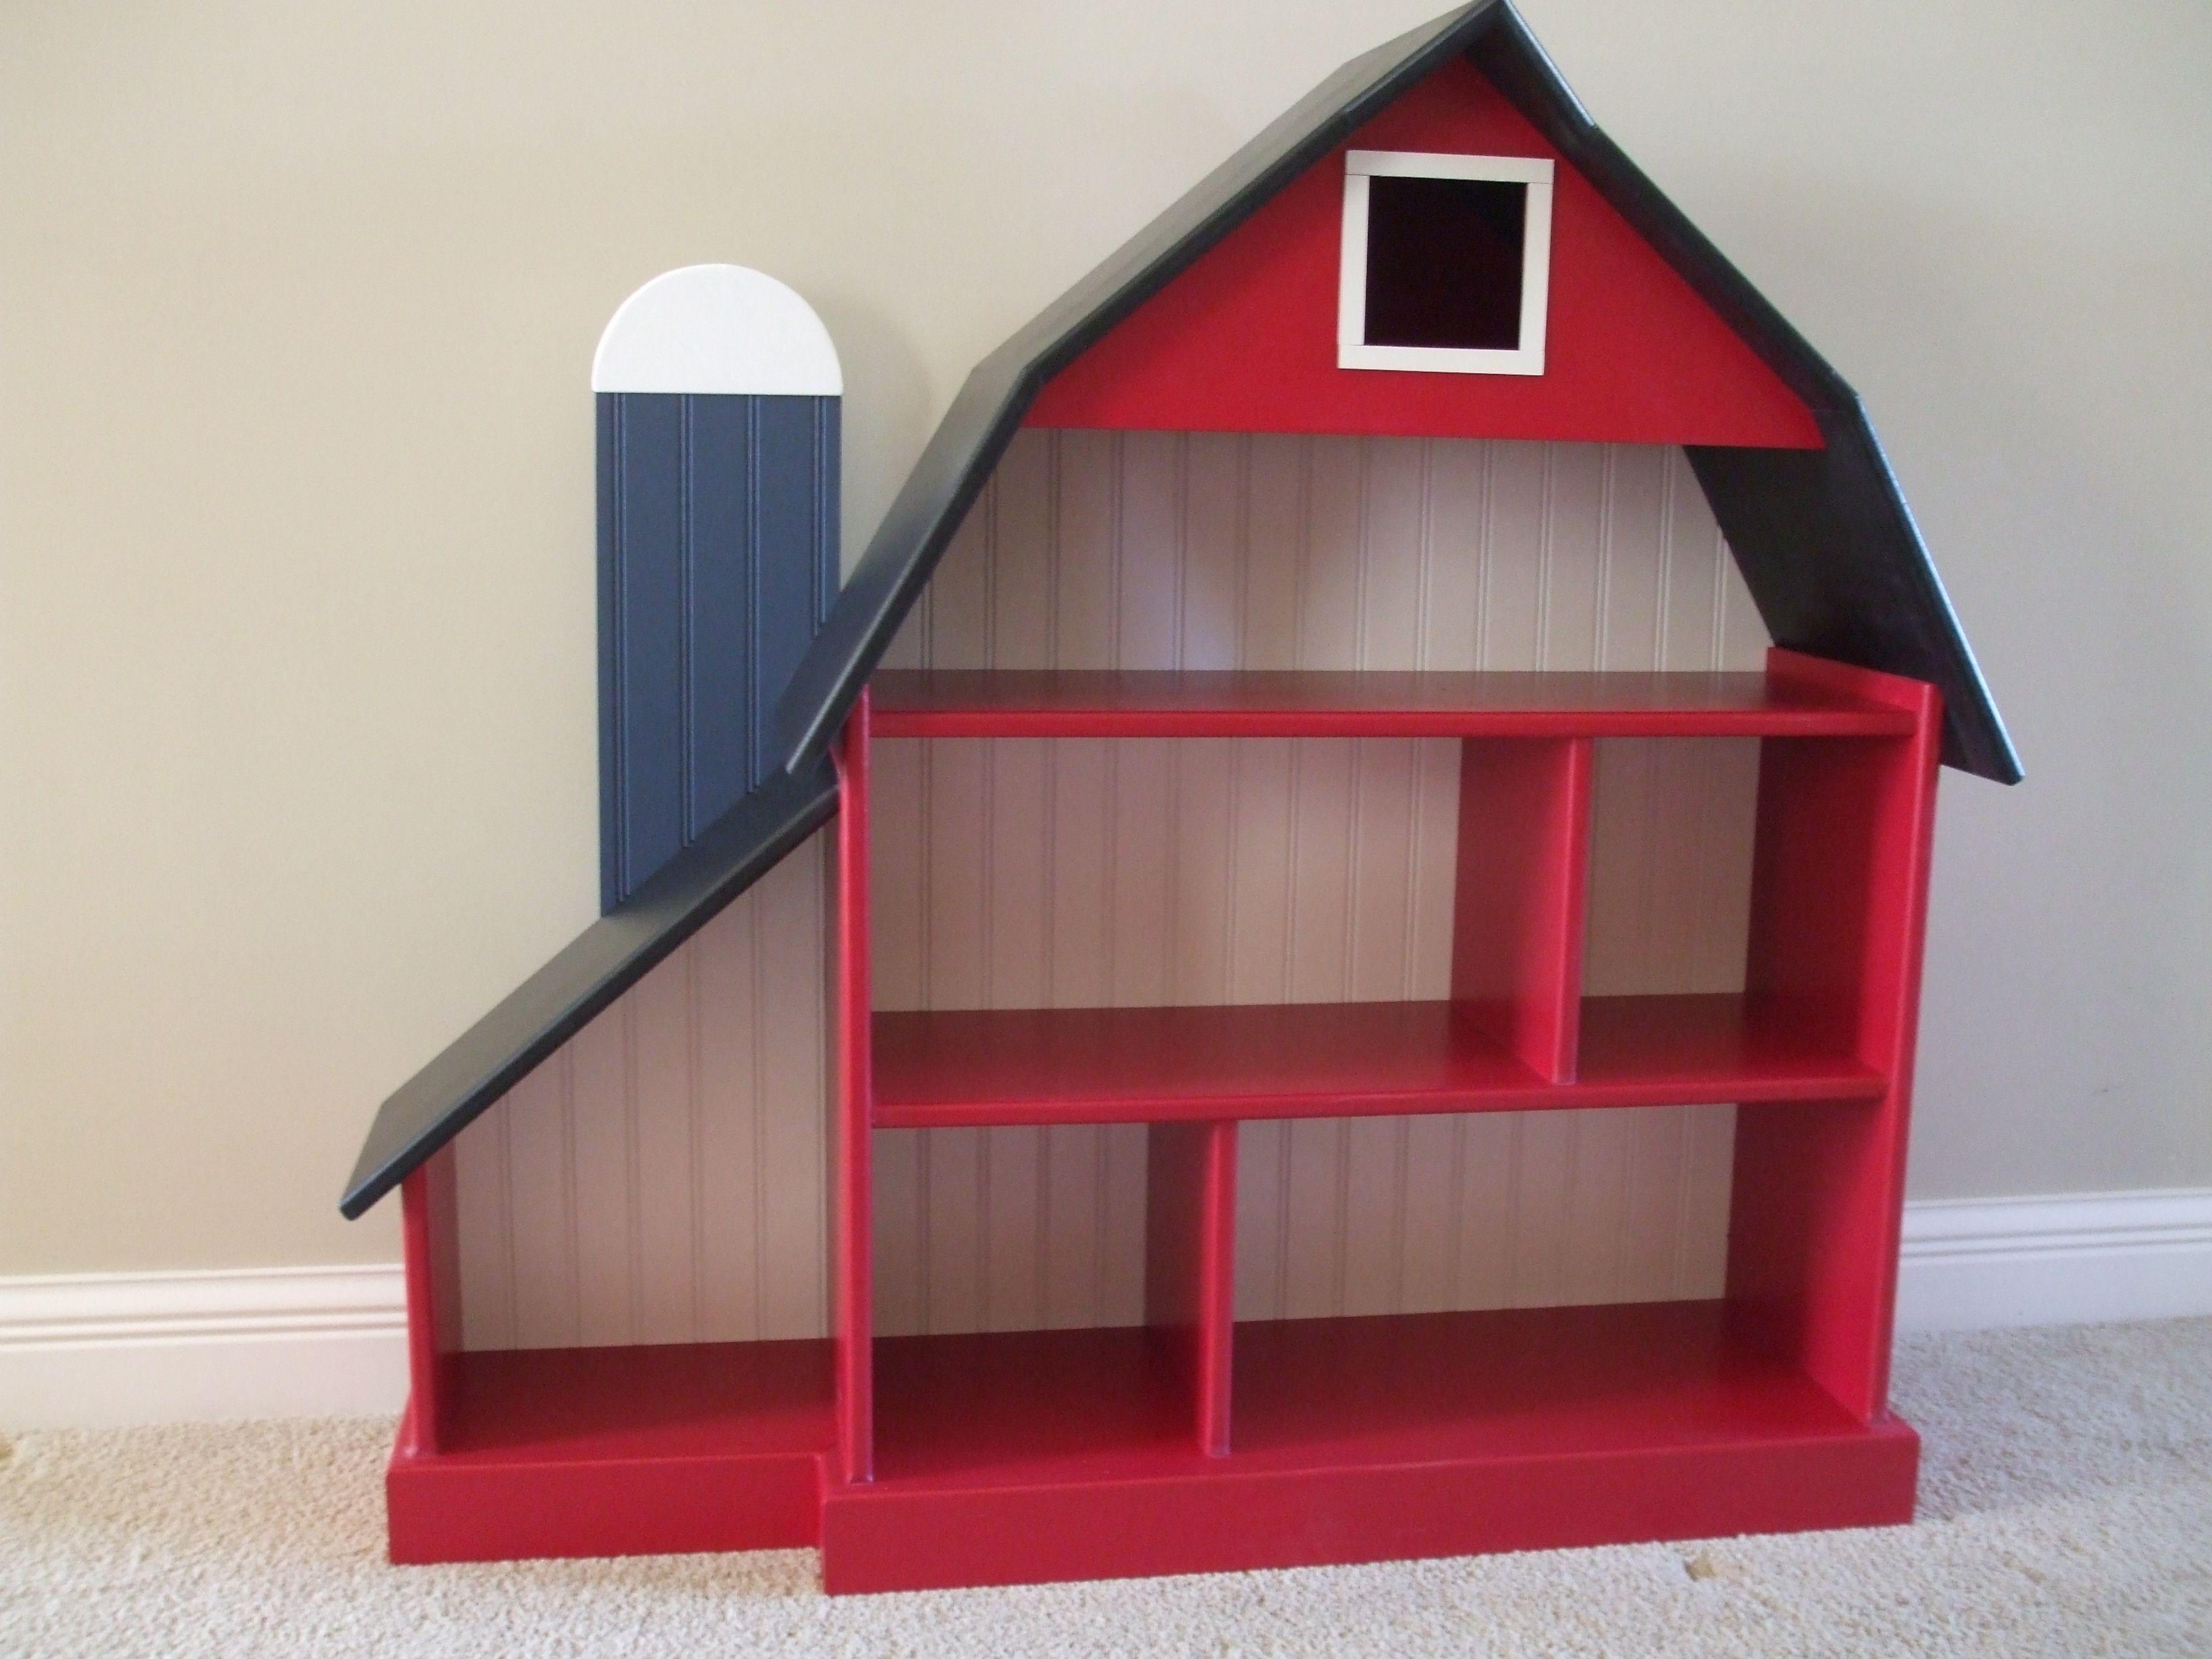 craigslist livingroom diy for ideas target stunning barns barn bookcase backyards dimensions dollhouse bookshelf ny bookshelves about pottery